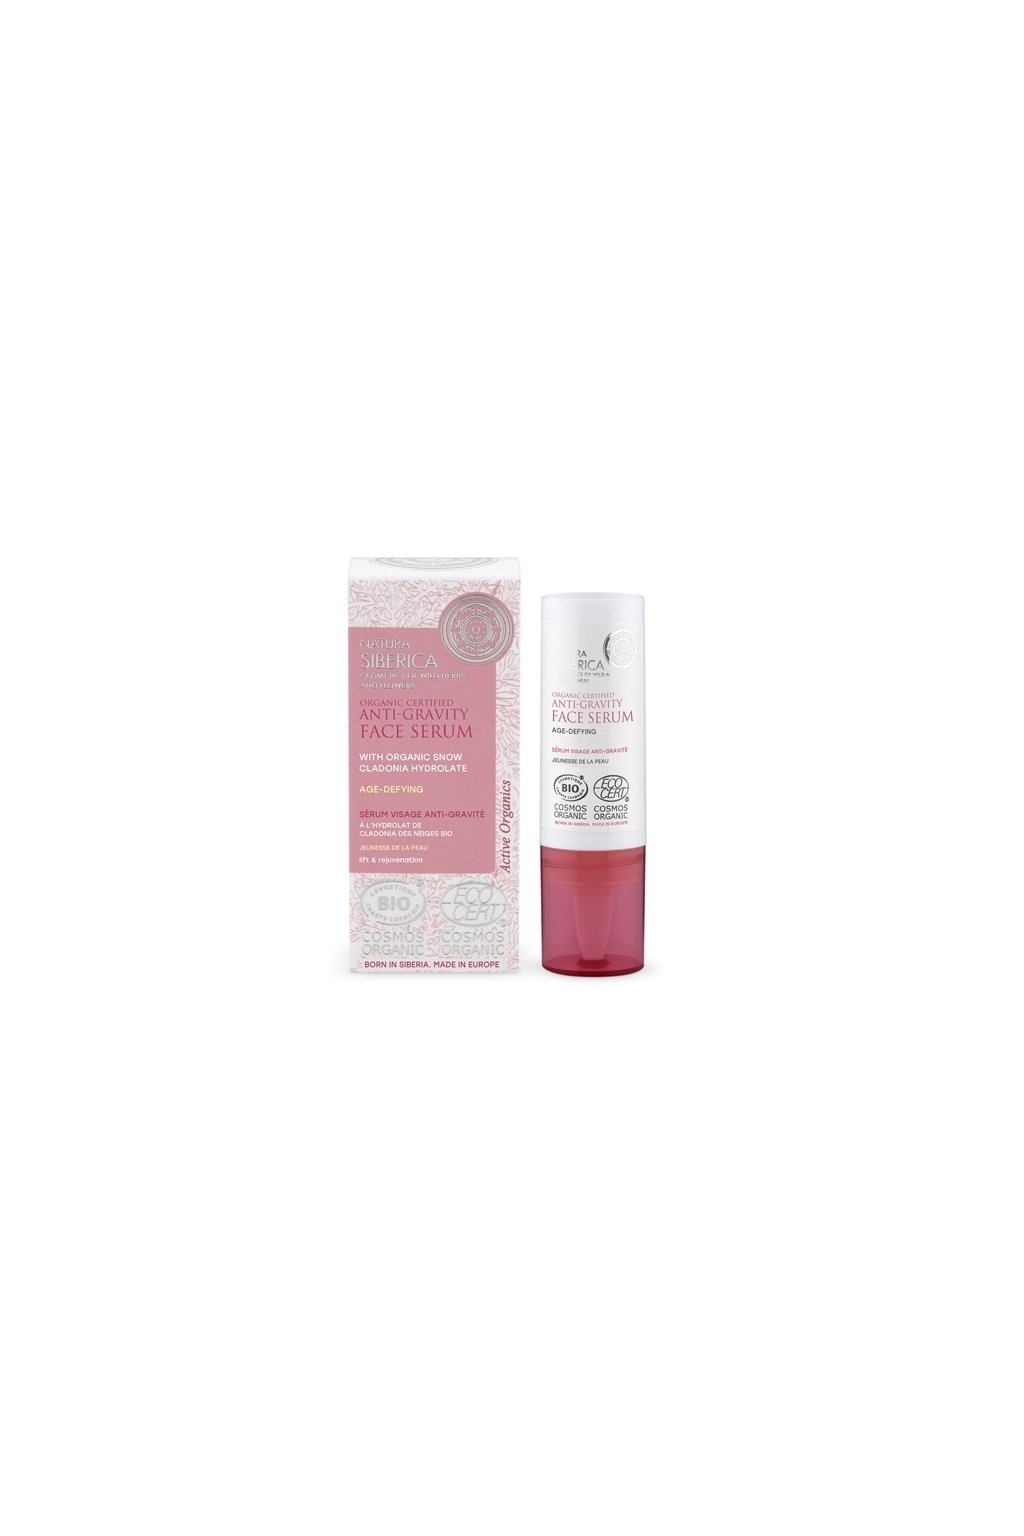 21224 natura siberica organic certified anti aging facelifting serum 15ml